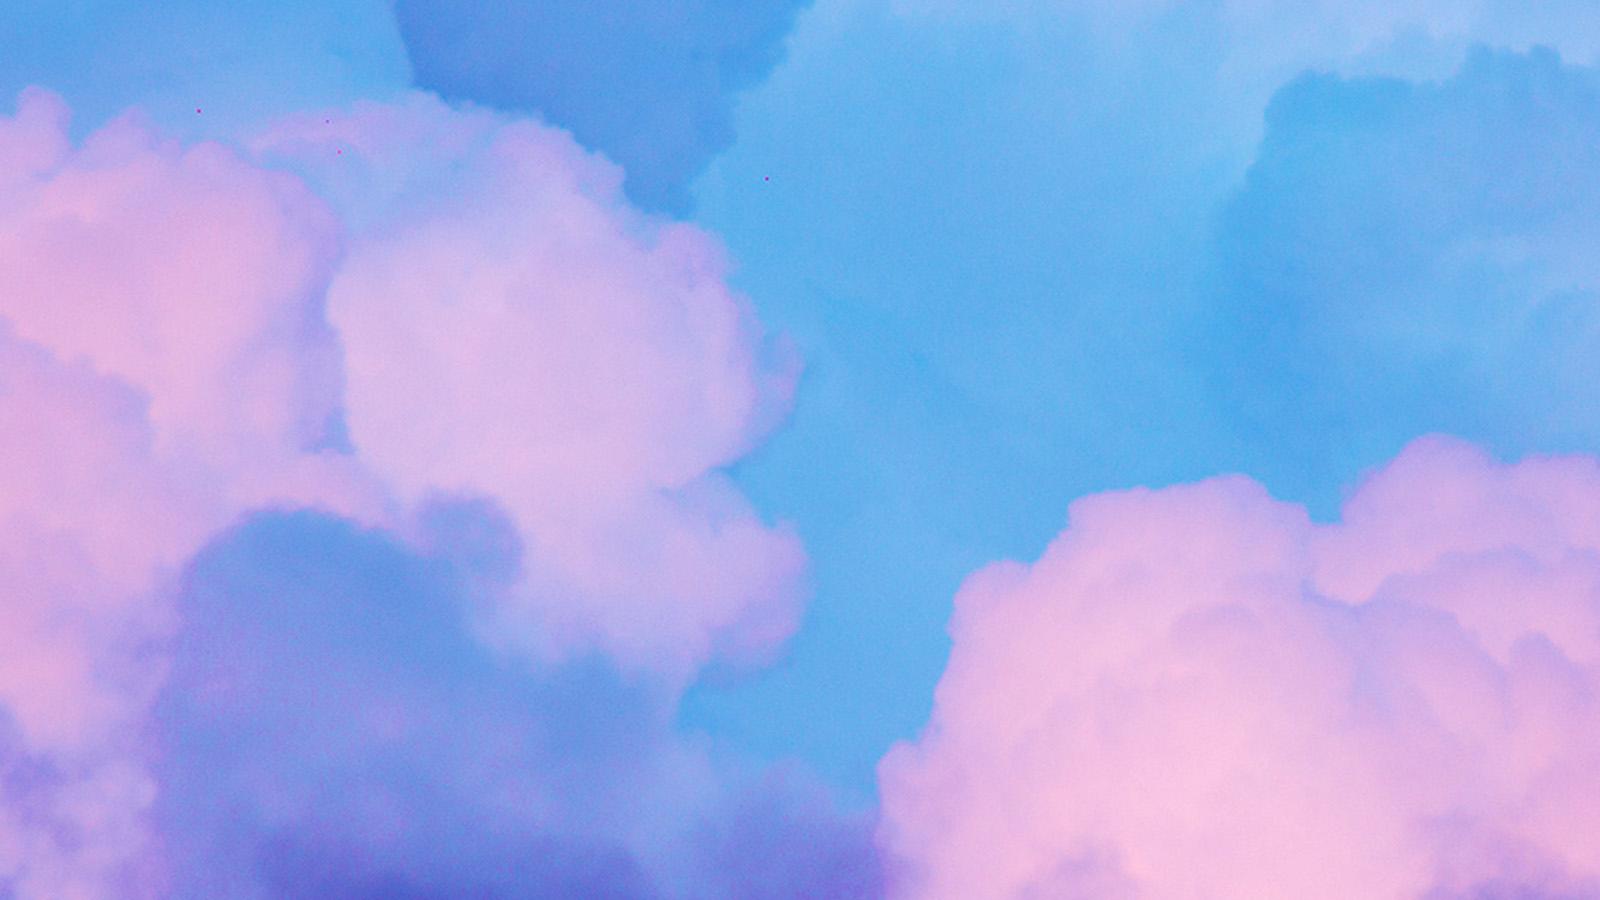 Bj16 Sky Blue Pastel Art Wallpaper